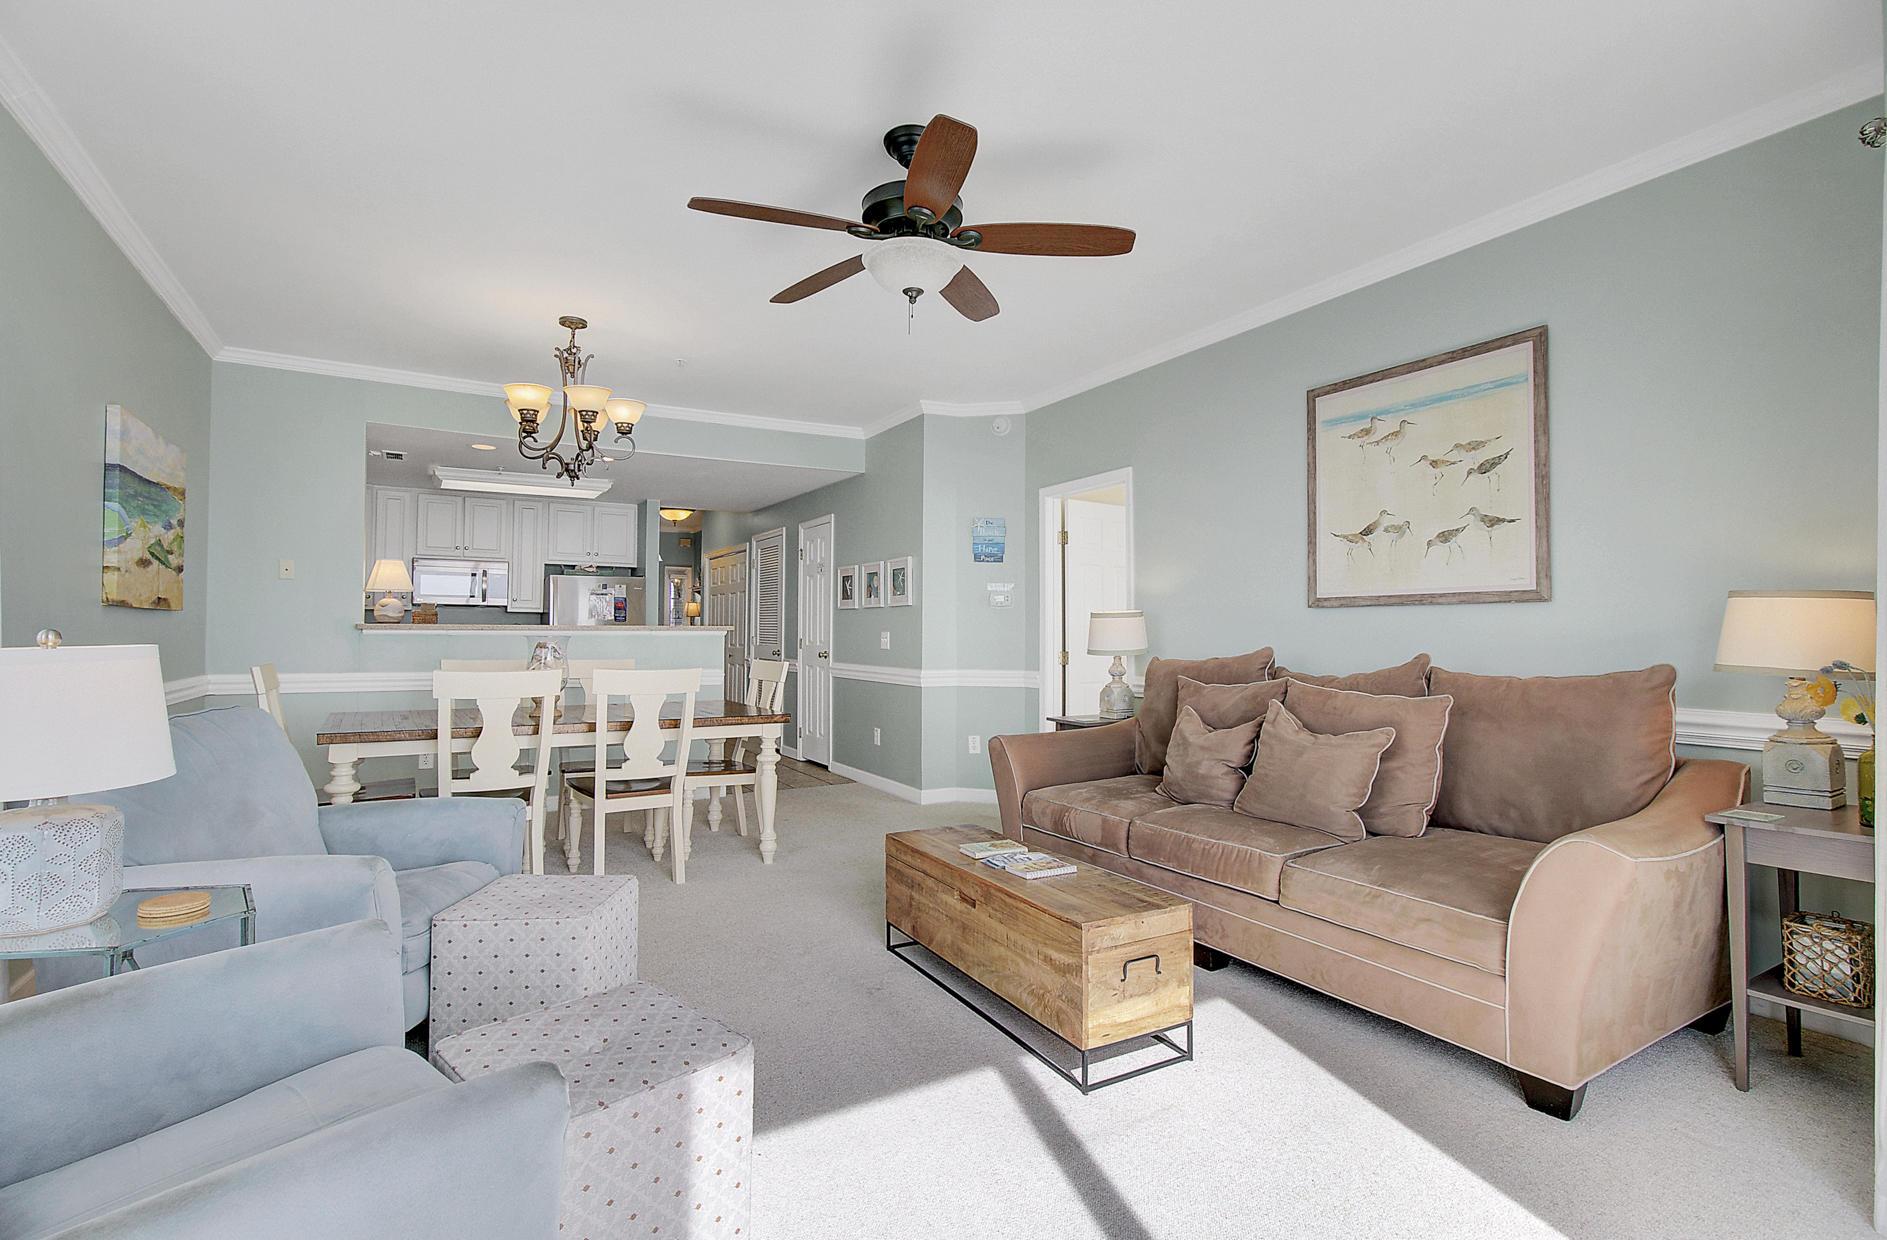 Seaside Villas I Homes For Sale - 111 Arctic, Folly Beach, SC - 2